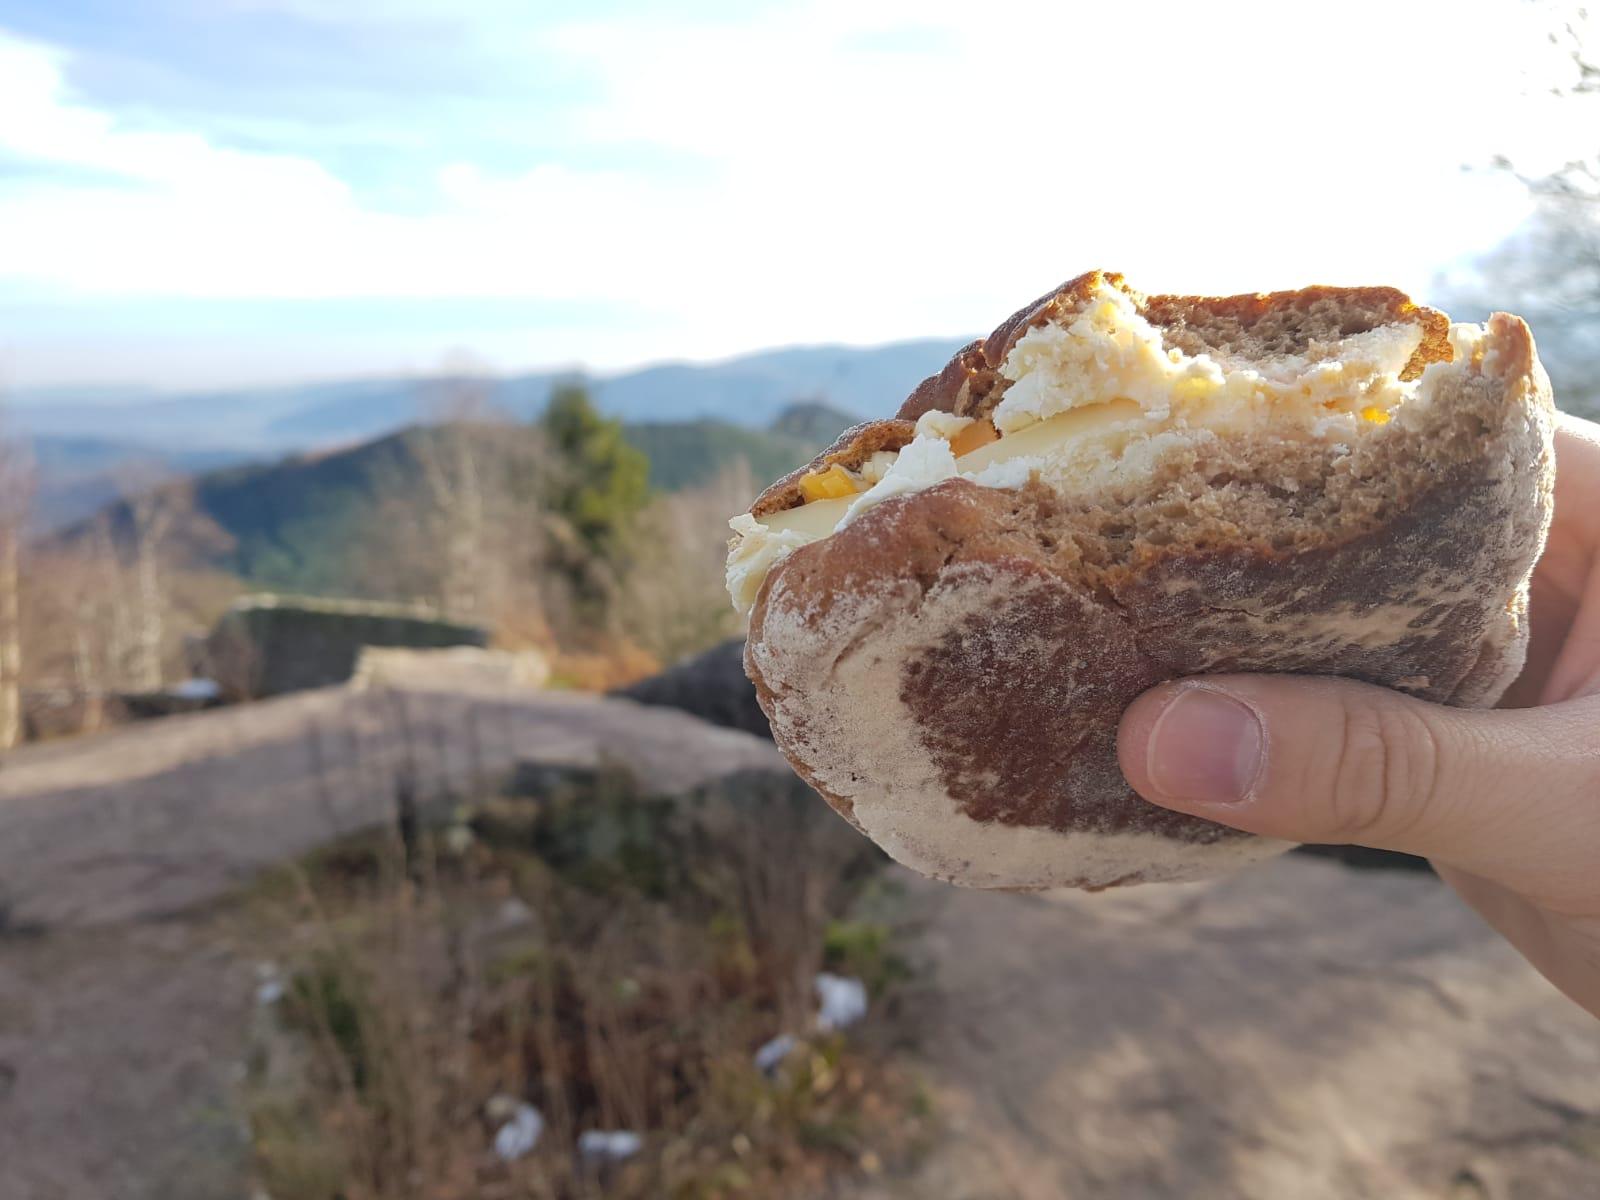 Wanderproviant: Drei-Käse-Brötchen